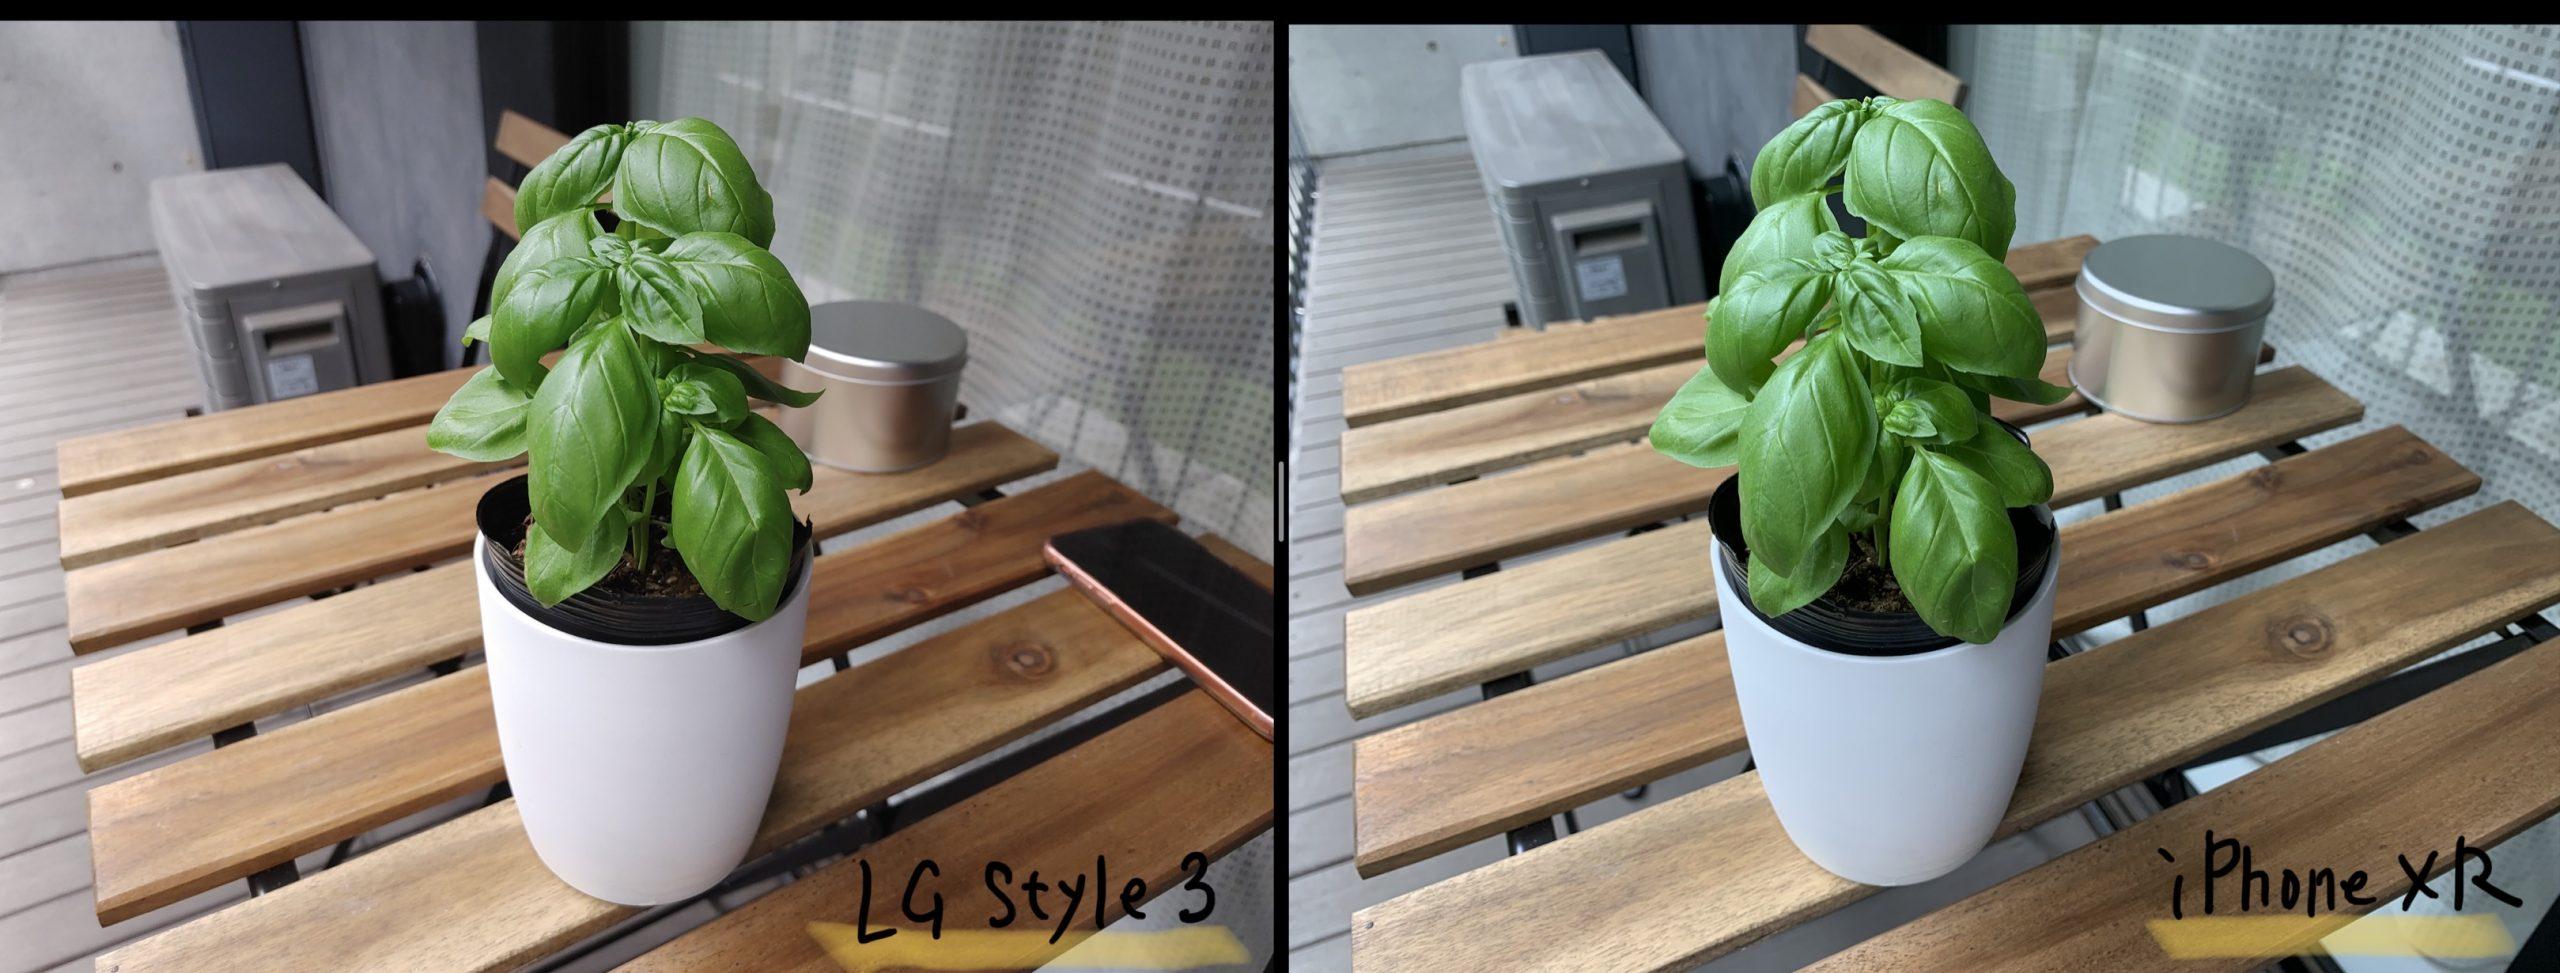 LG style3とiPhone XRで撮影